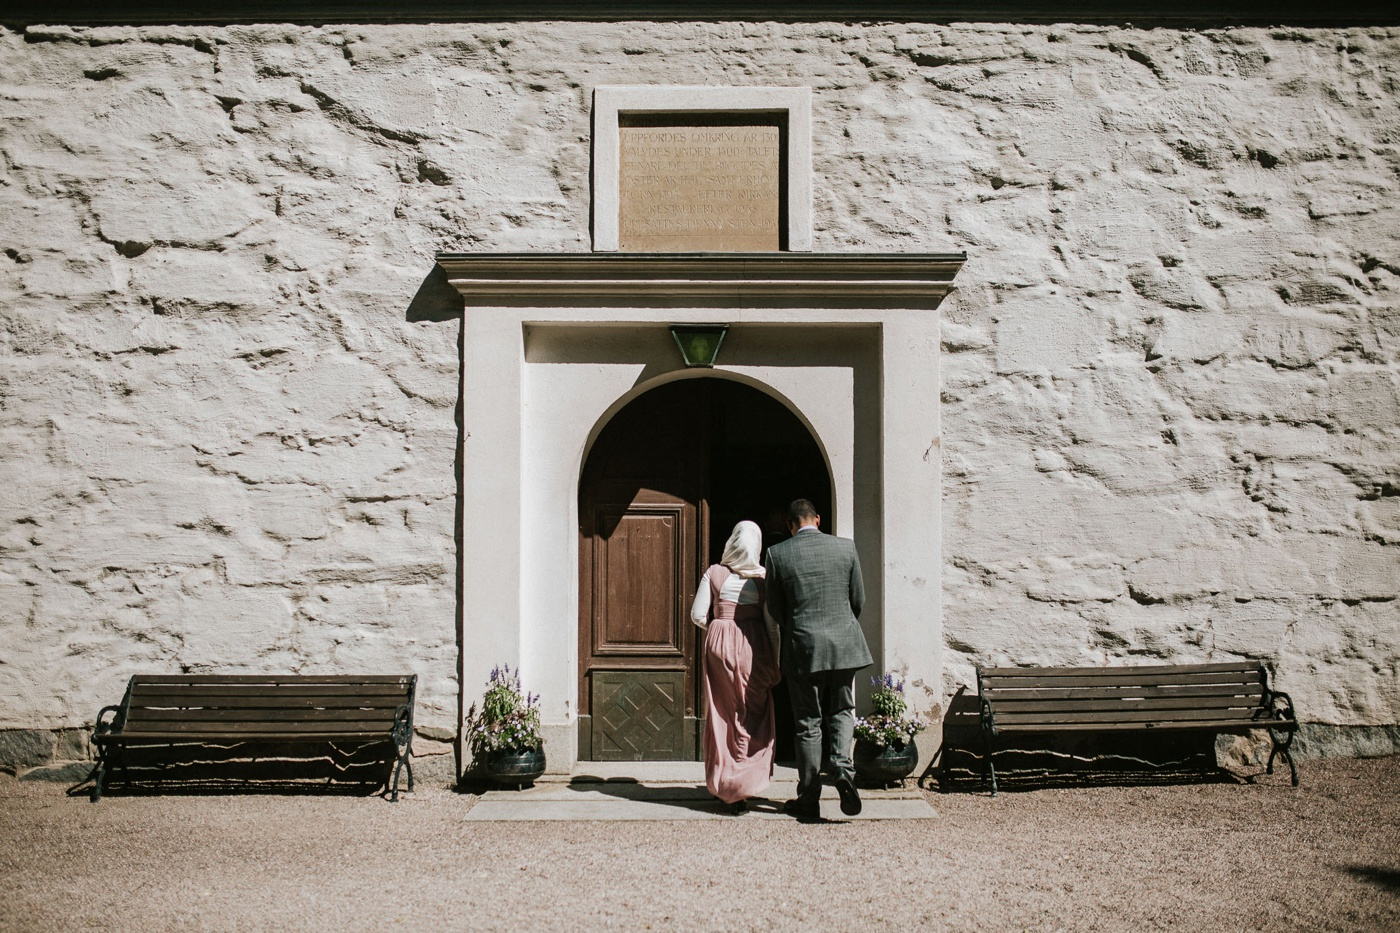 ceciliajoakim_sweden-countryside-summer-wedding_melbourne-fun-quirky-wedding-photography_5